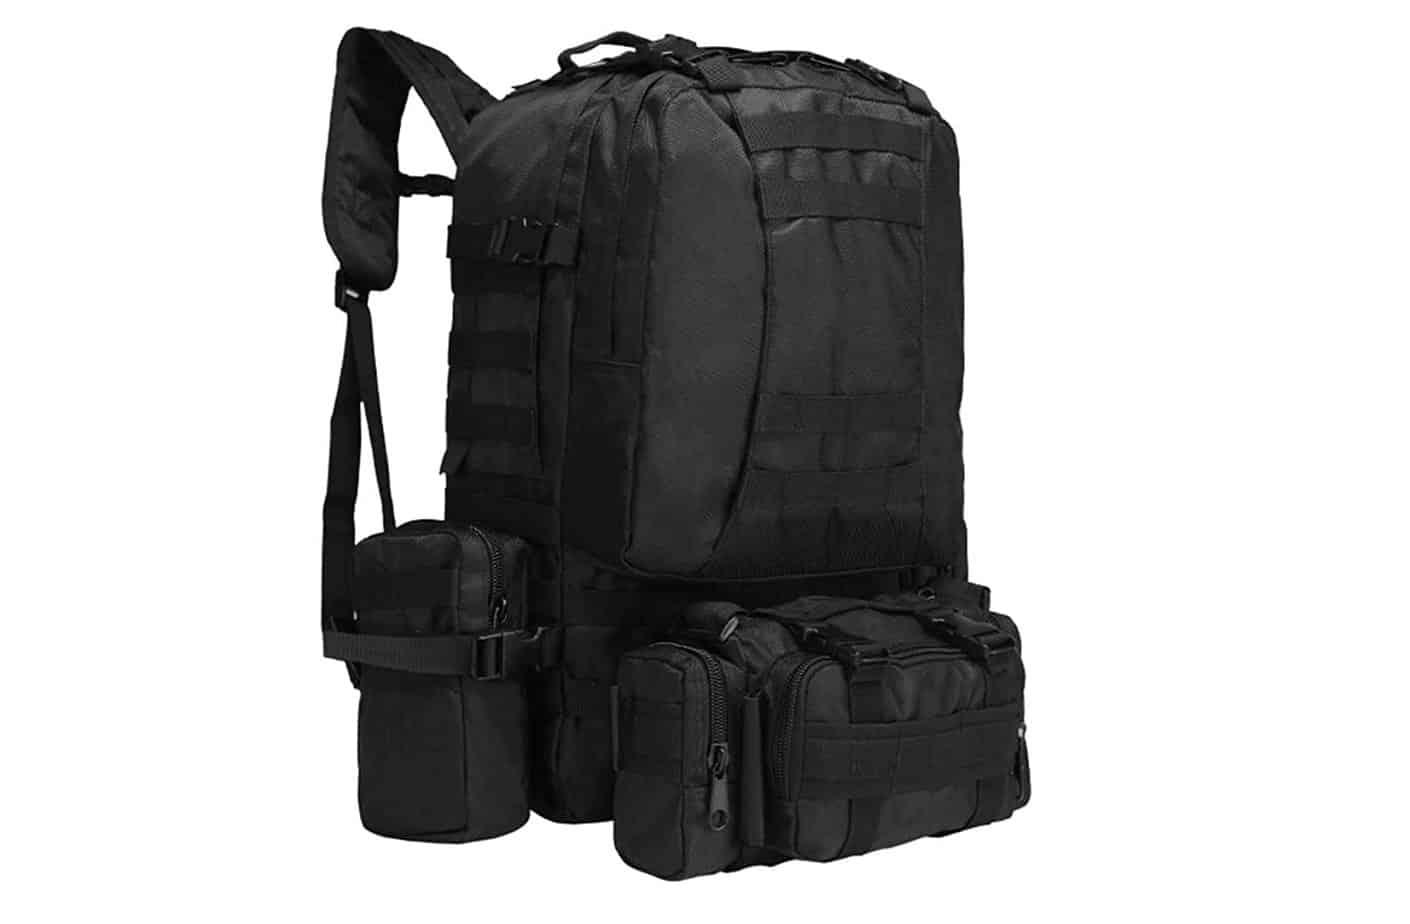 suoki Tactical backpack